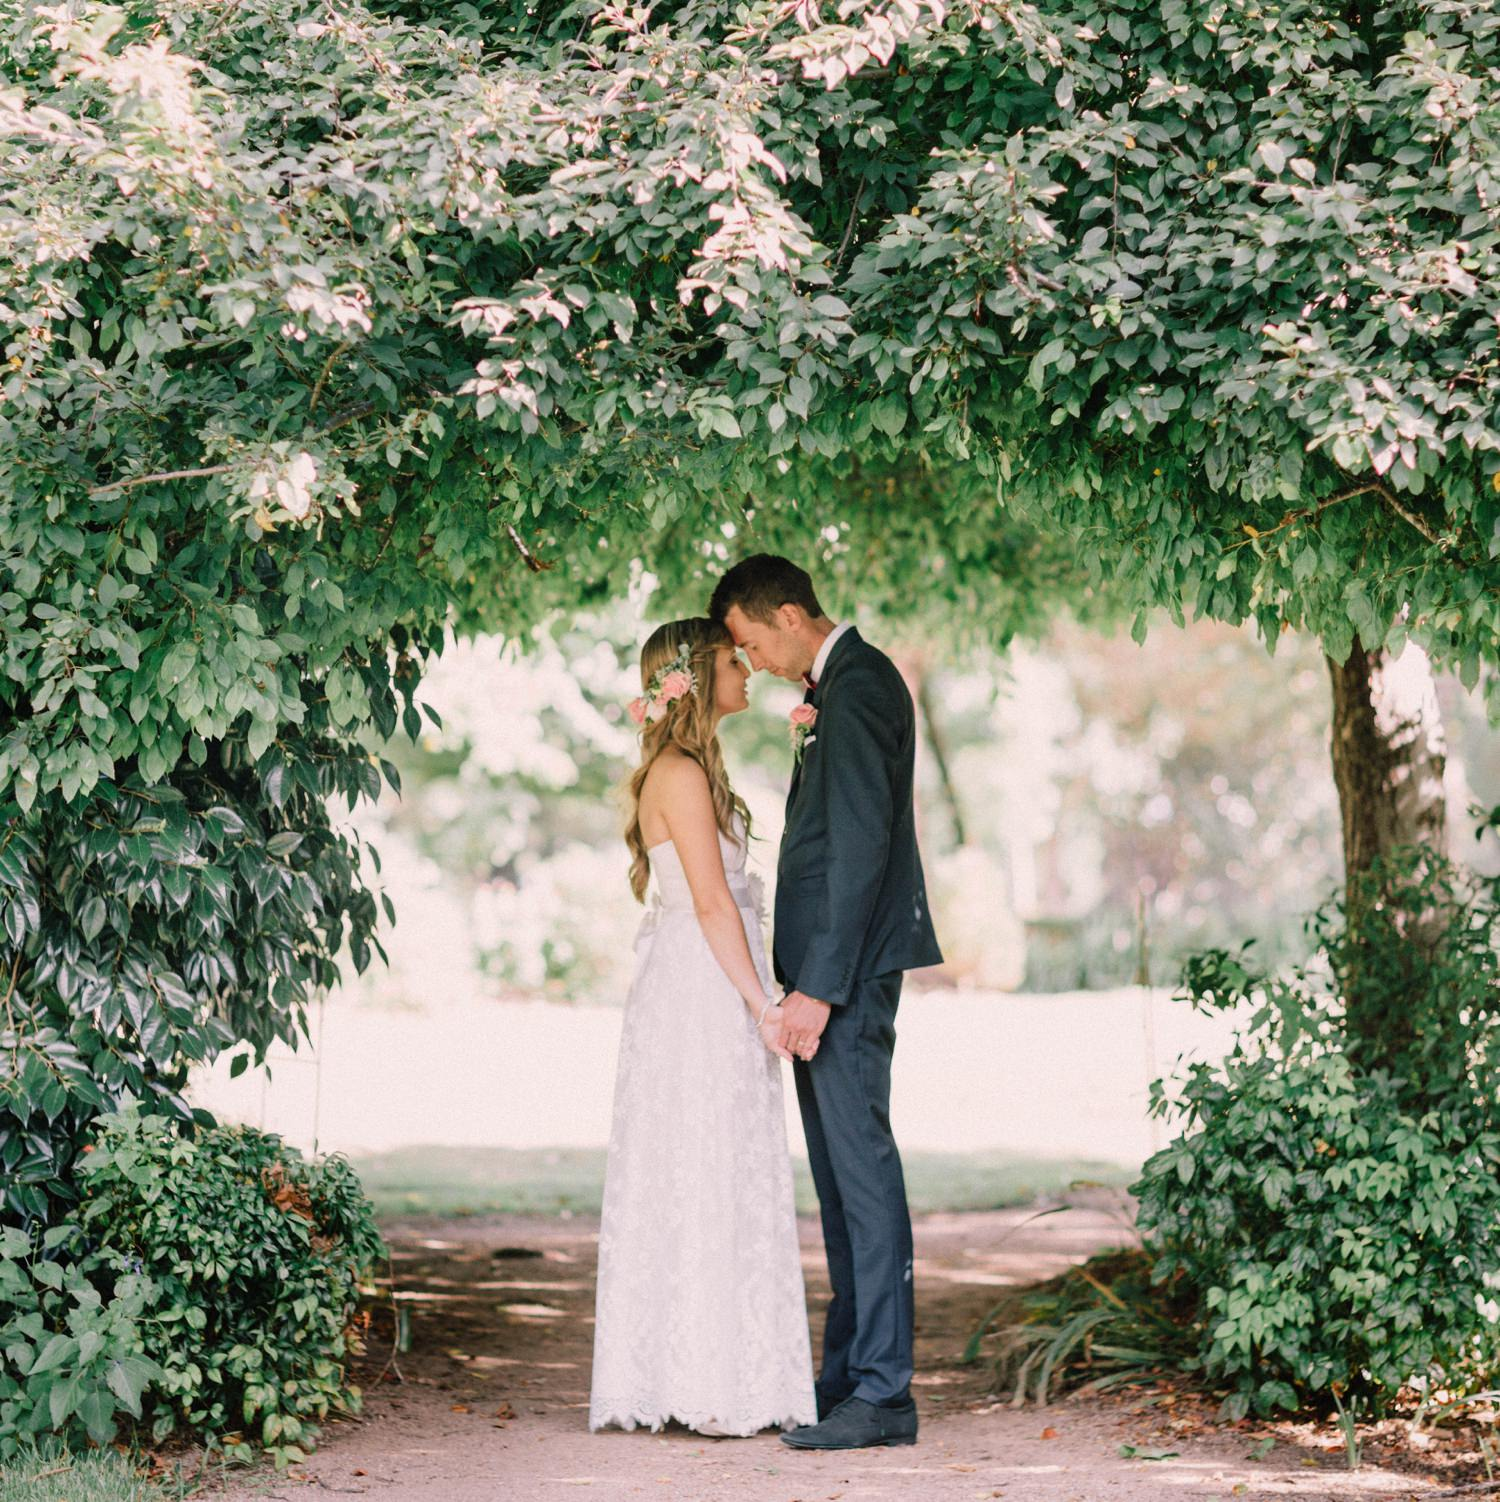 Stephanie + Will : Sylvan Glen Country Wedding | Southern Highlands